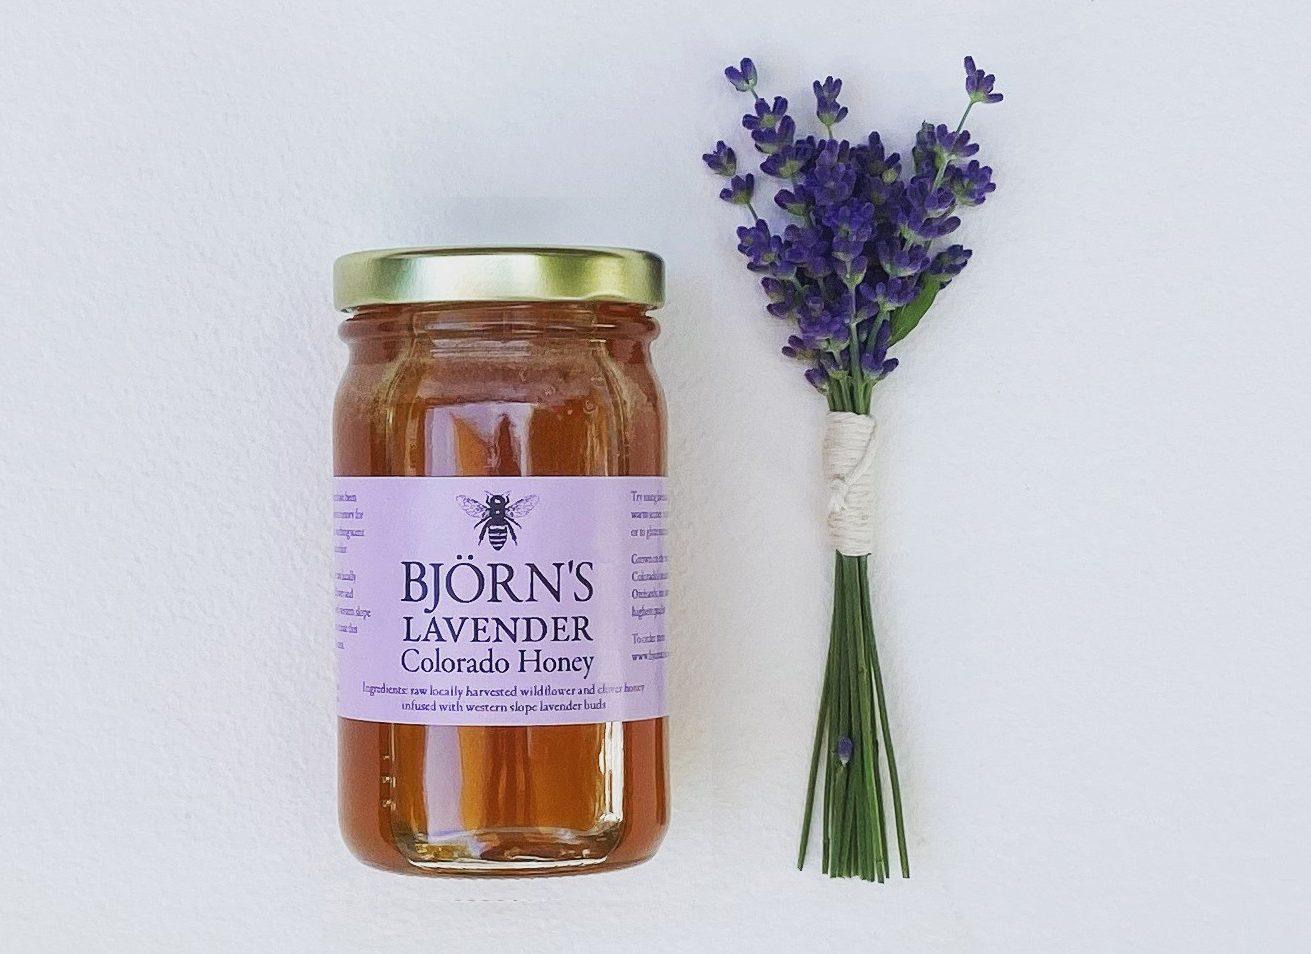 Bjorns Colorado Honey Lavender Honey